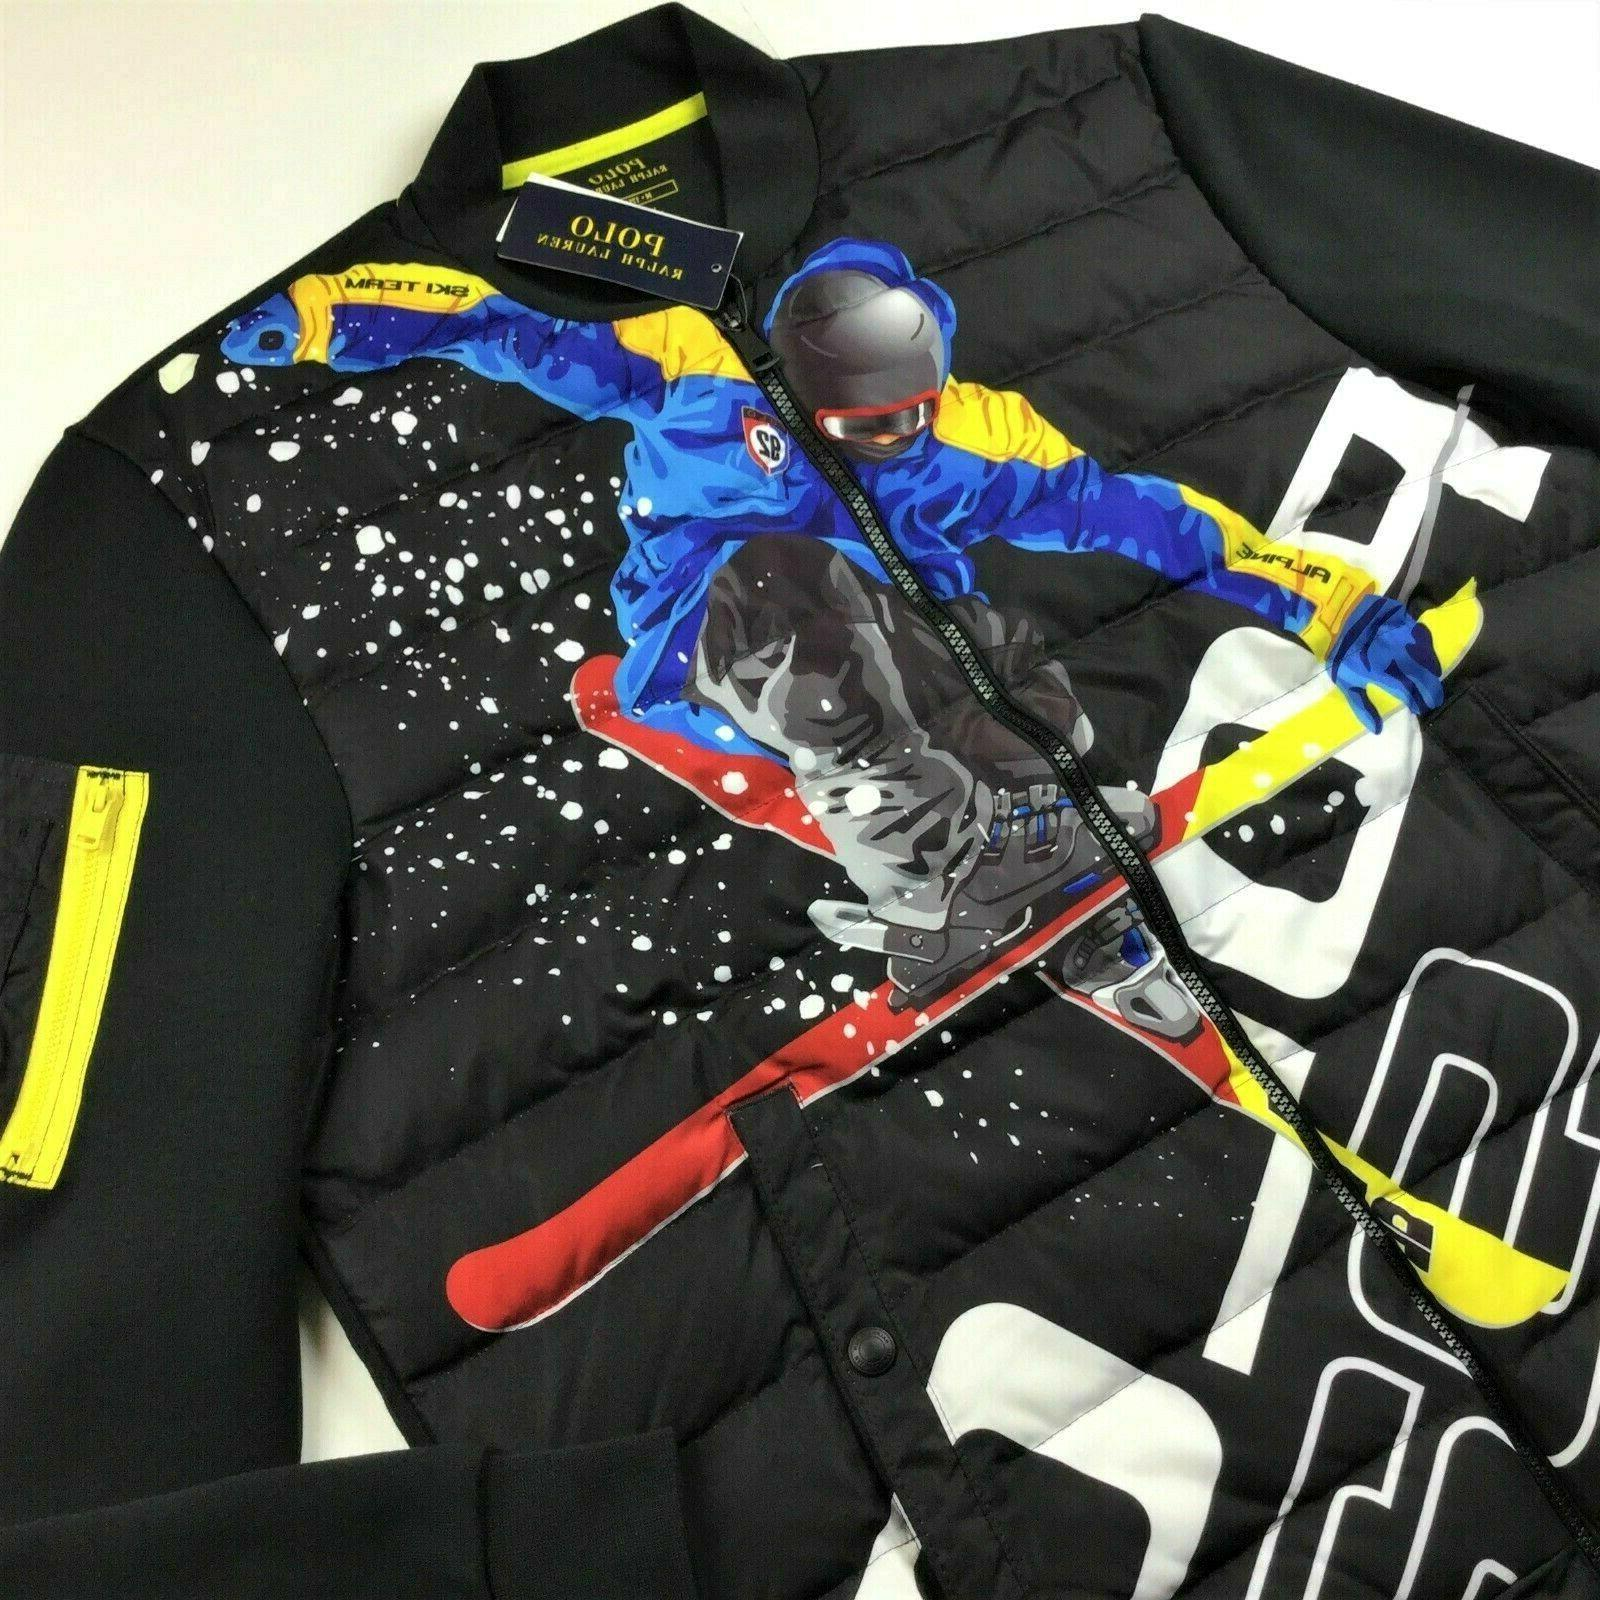 alpine downhill ski 92 suicide down jacket